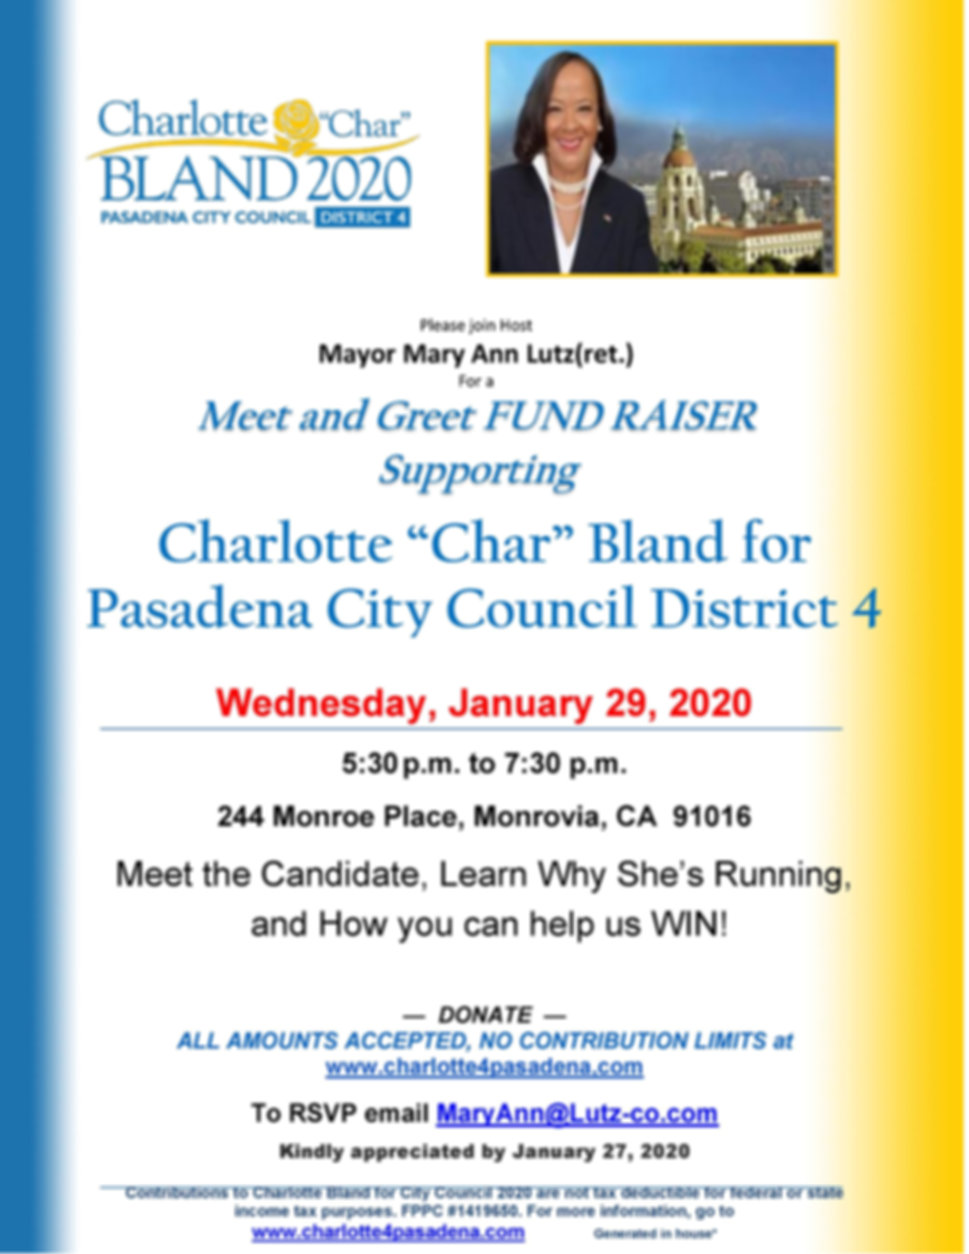 Char Bland meet and greet MA Lutz 1.29.2